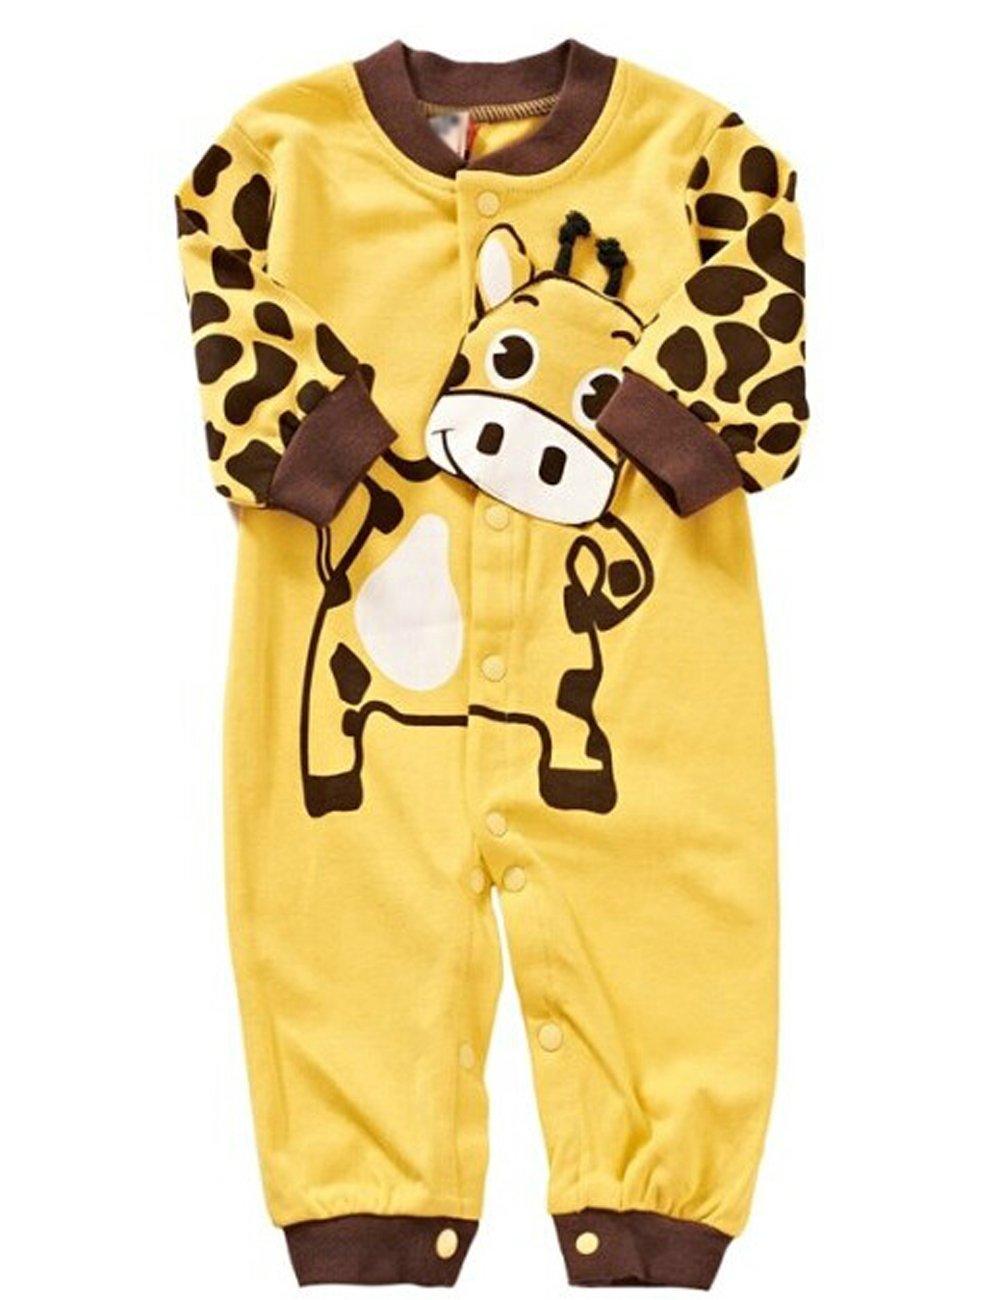 Cute Newborn Infant Girl Boy Long Sleeve Romper Clothes Pajamas Nightwear (80(3-6Months), Yellow ground)